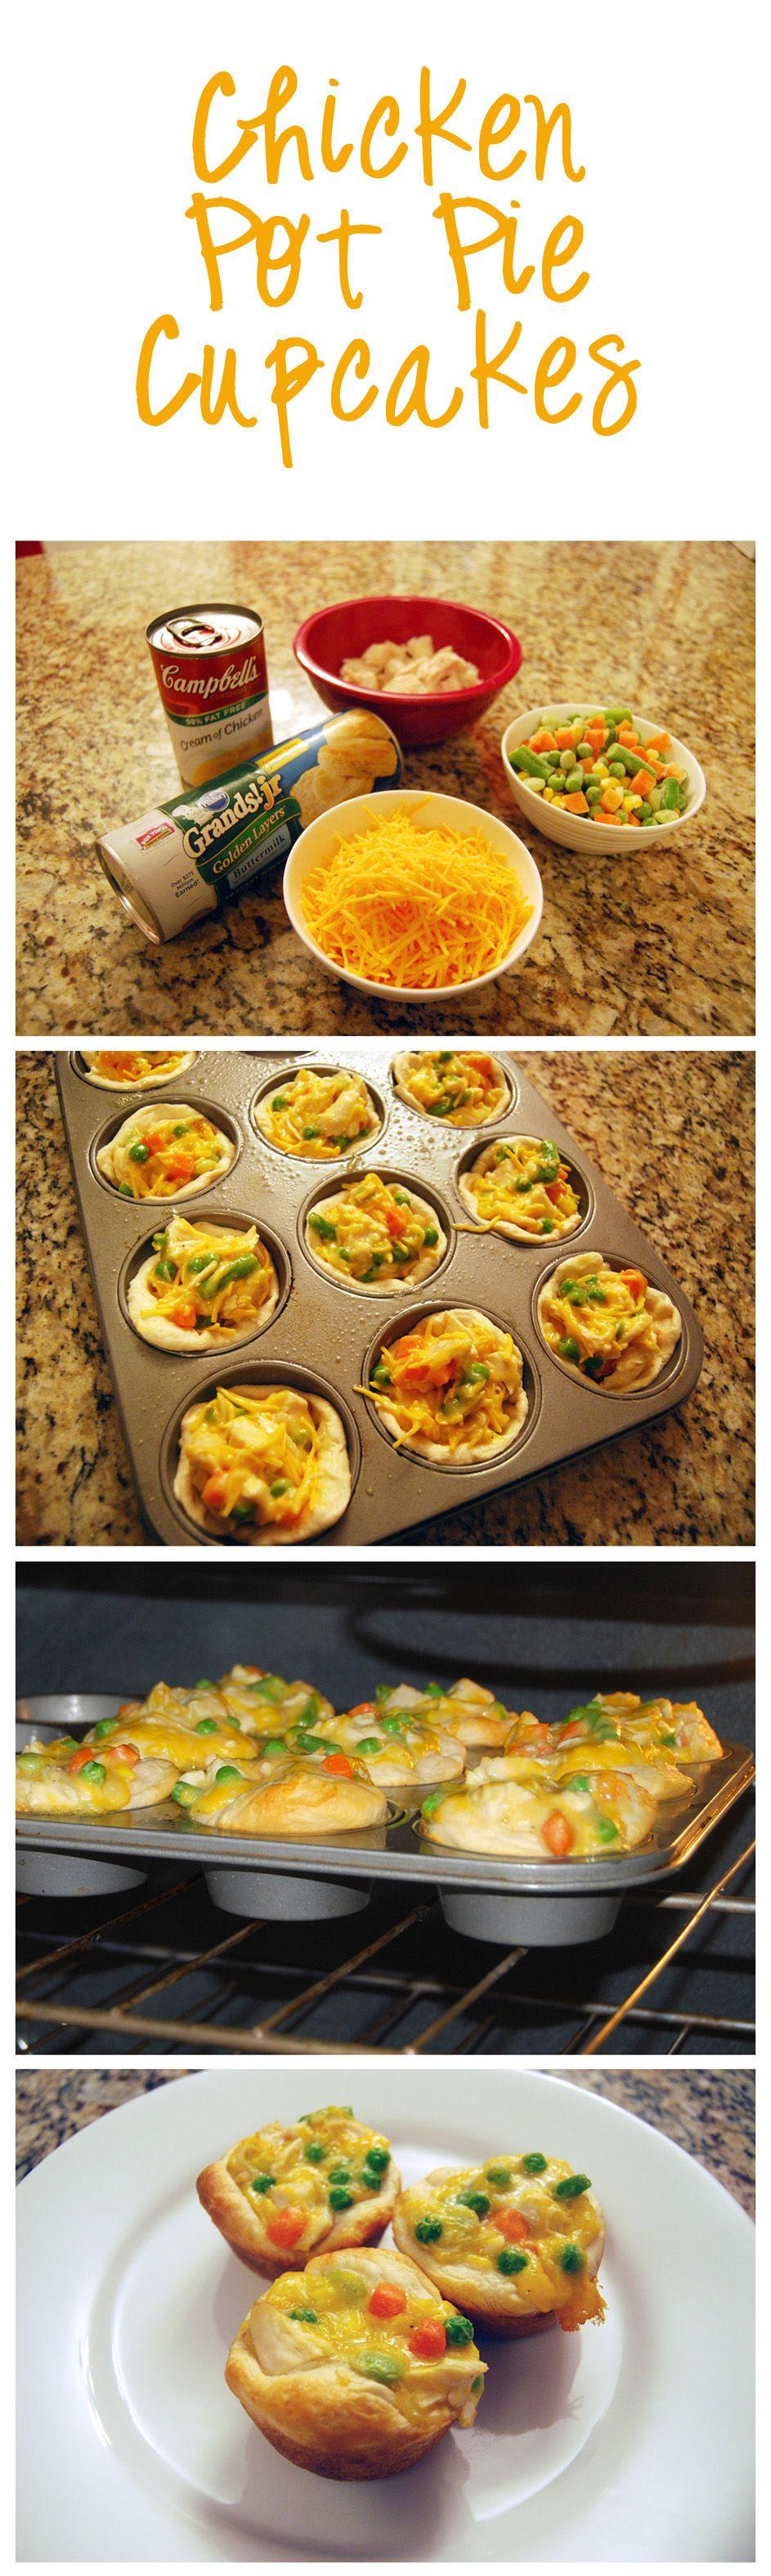 Mini Chicken Pot Pie Cupcakes | 25+ Muffin tin recipes for kids